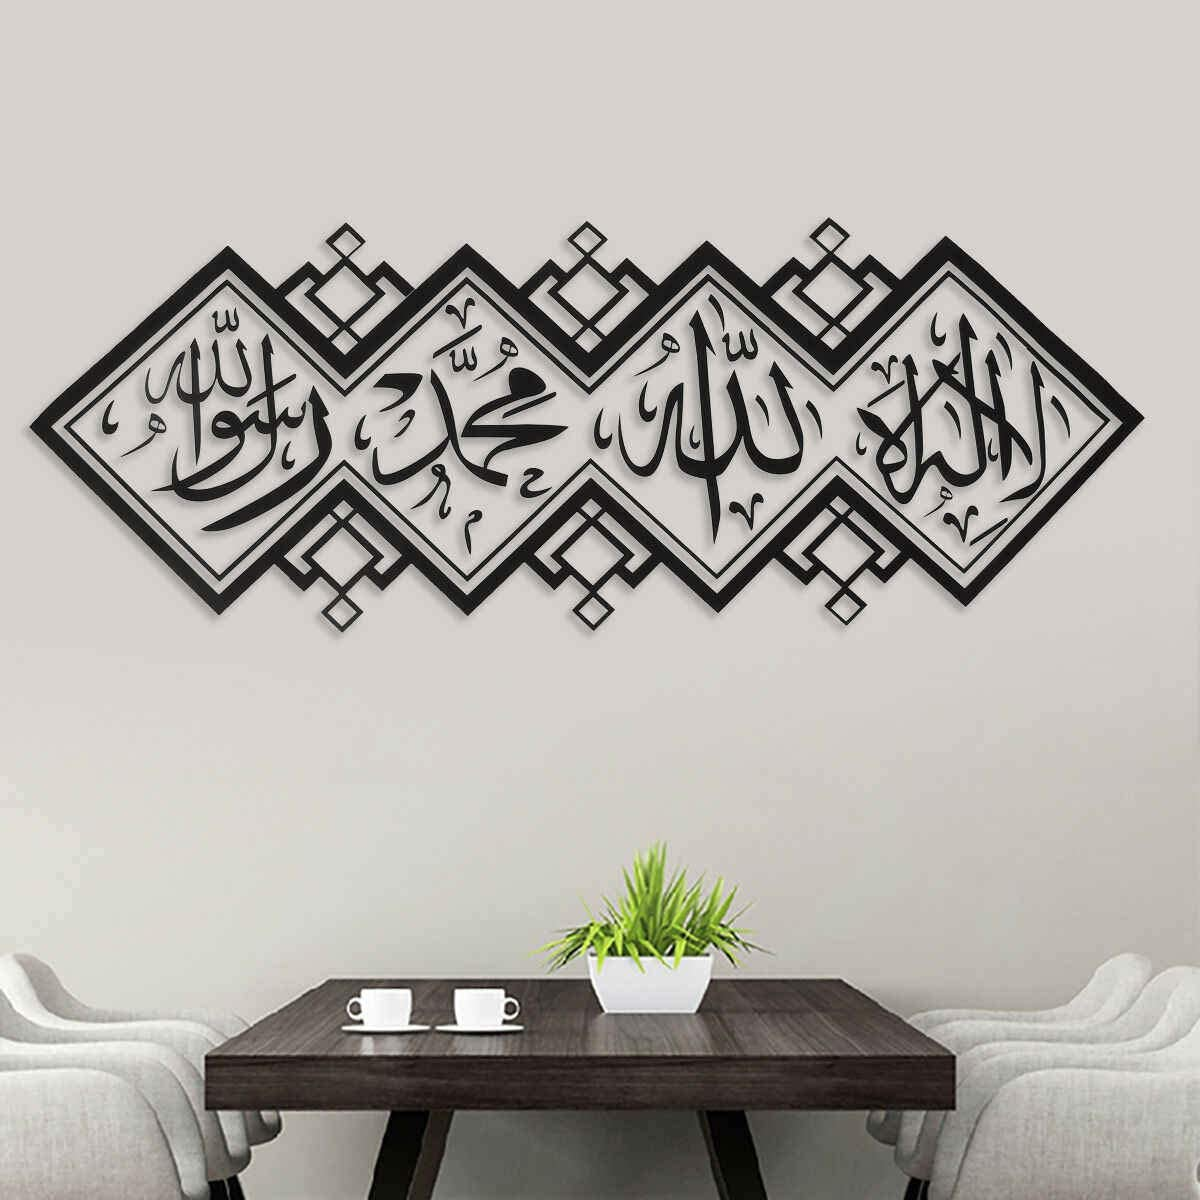 Home 人気ブランド多数対象 Decor お気に入 Arabic Art Word Mosque Islamic Muslim Detachable Isla